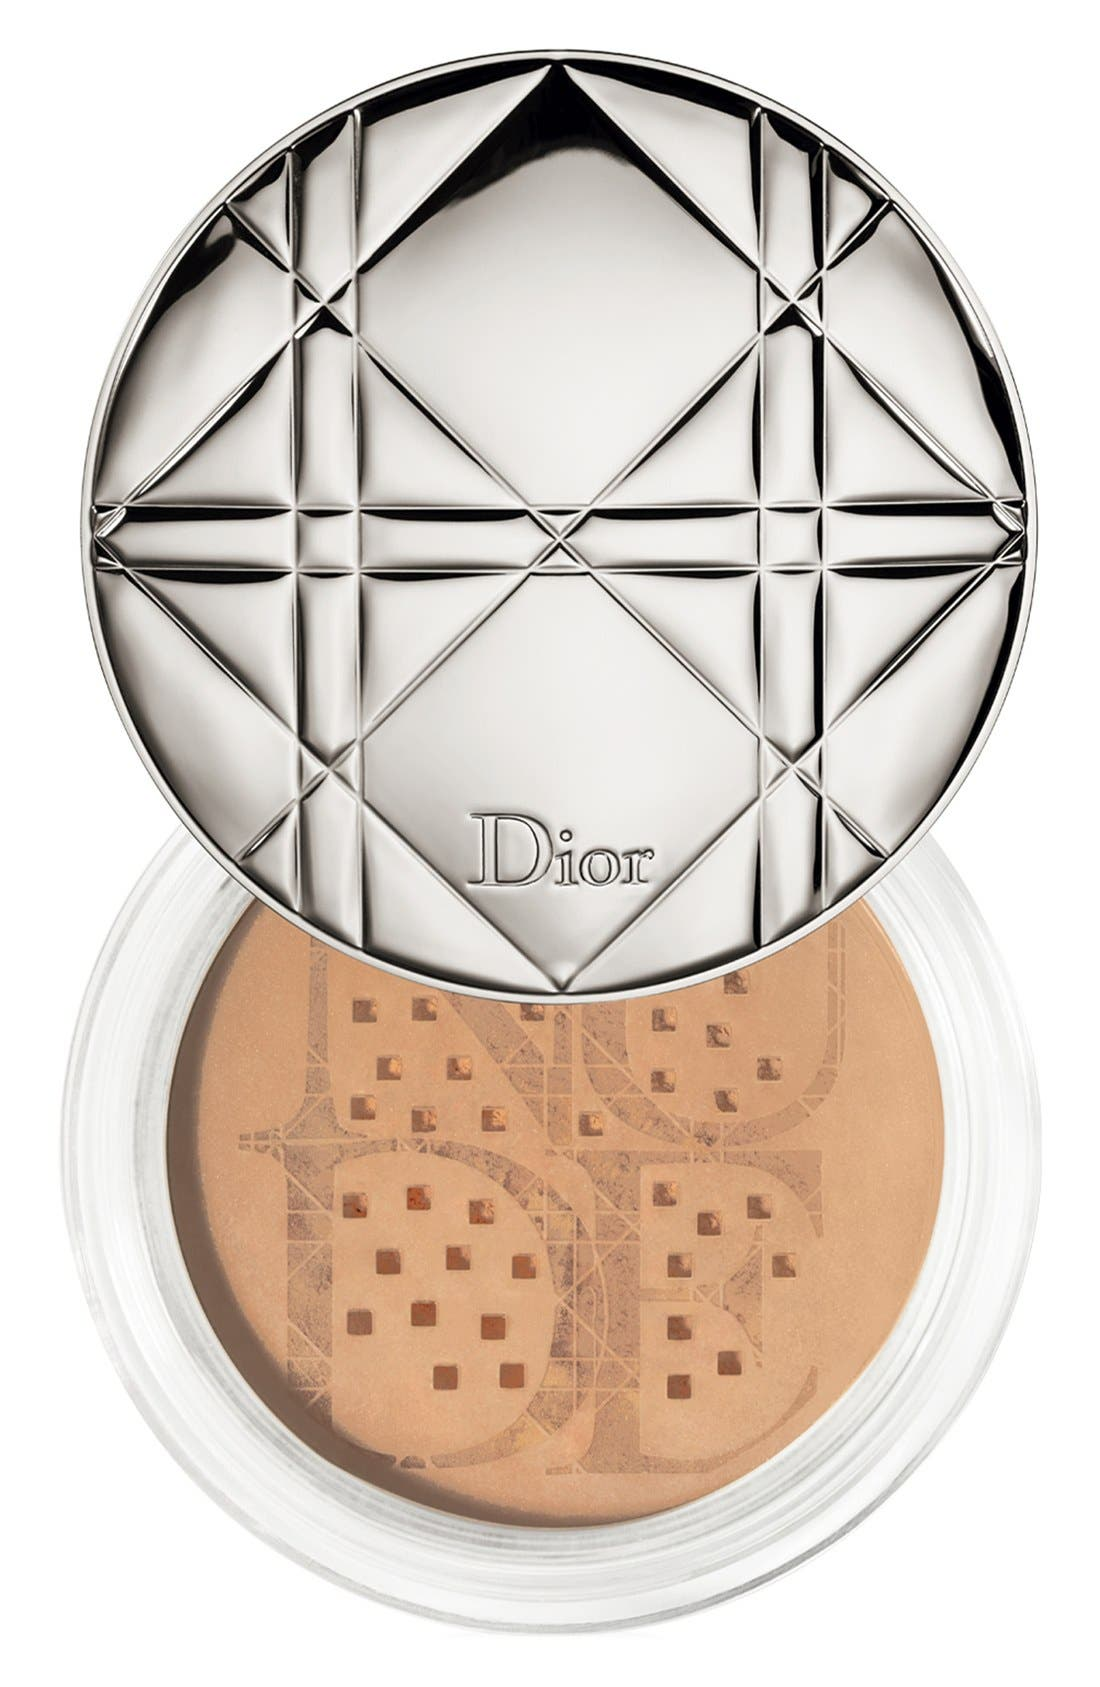 Dior 'Diorskin Nude Air' Healthy Glow Invisible Loose Powder